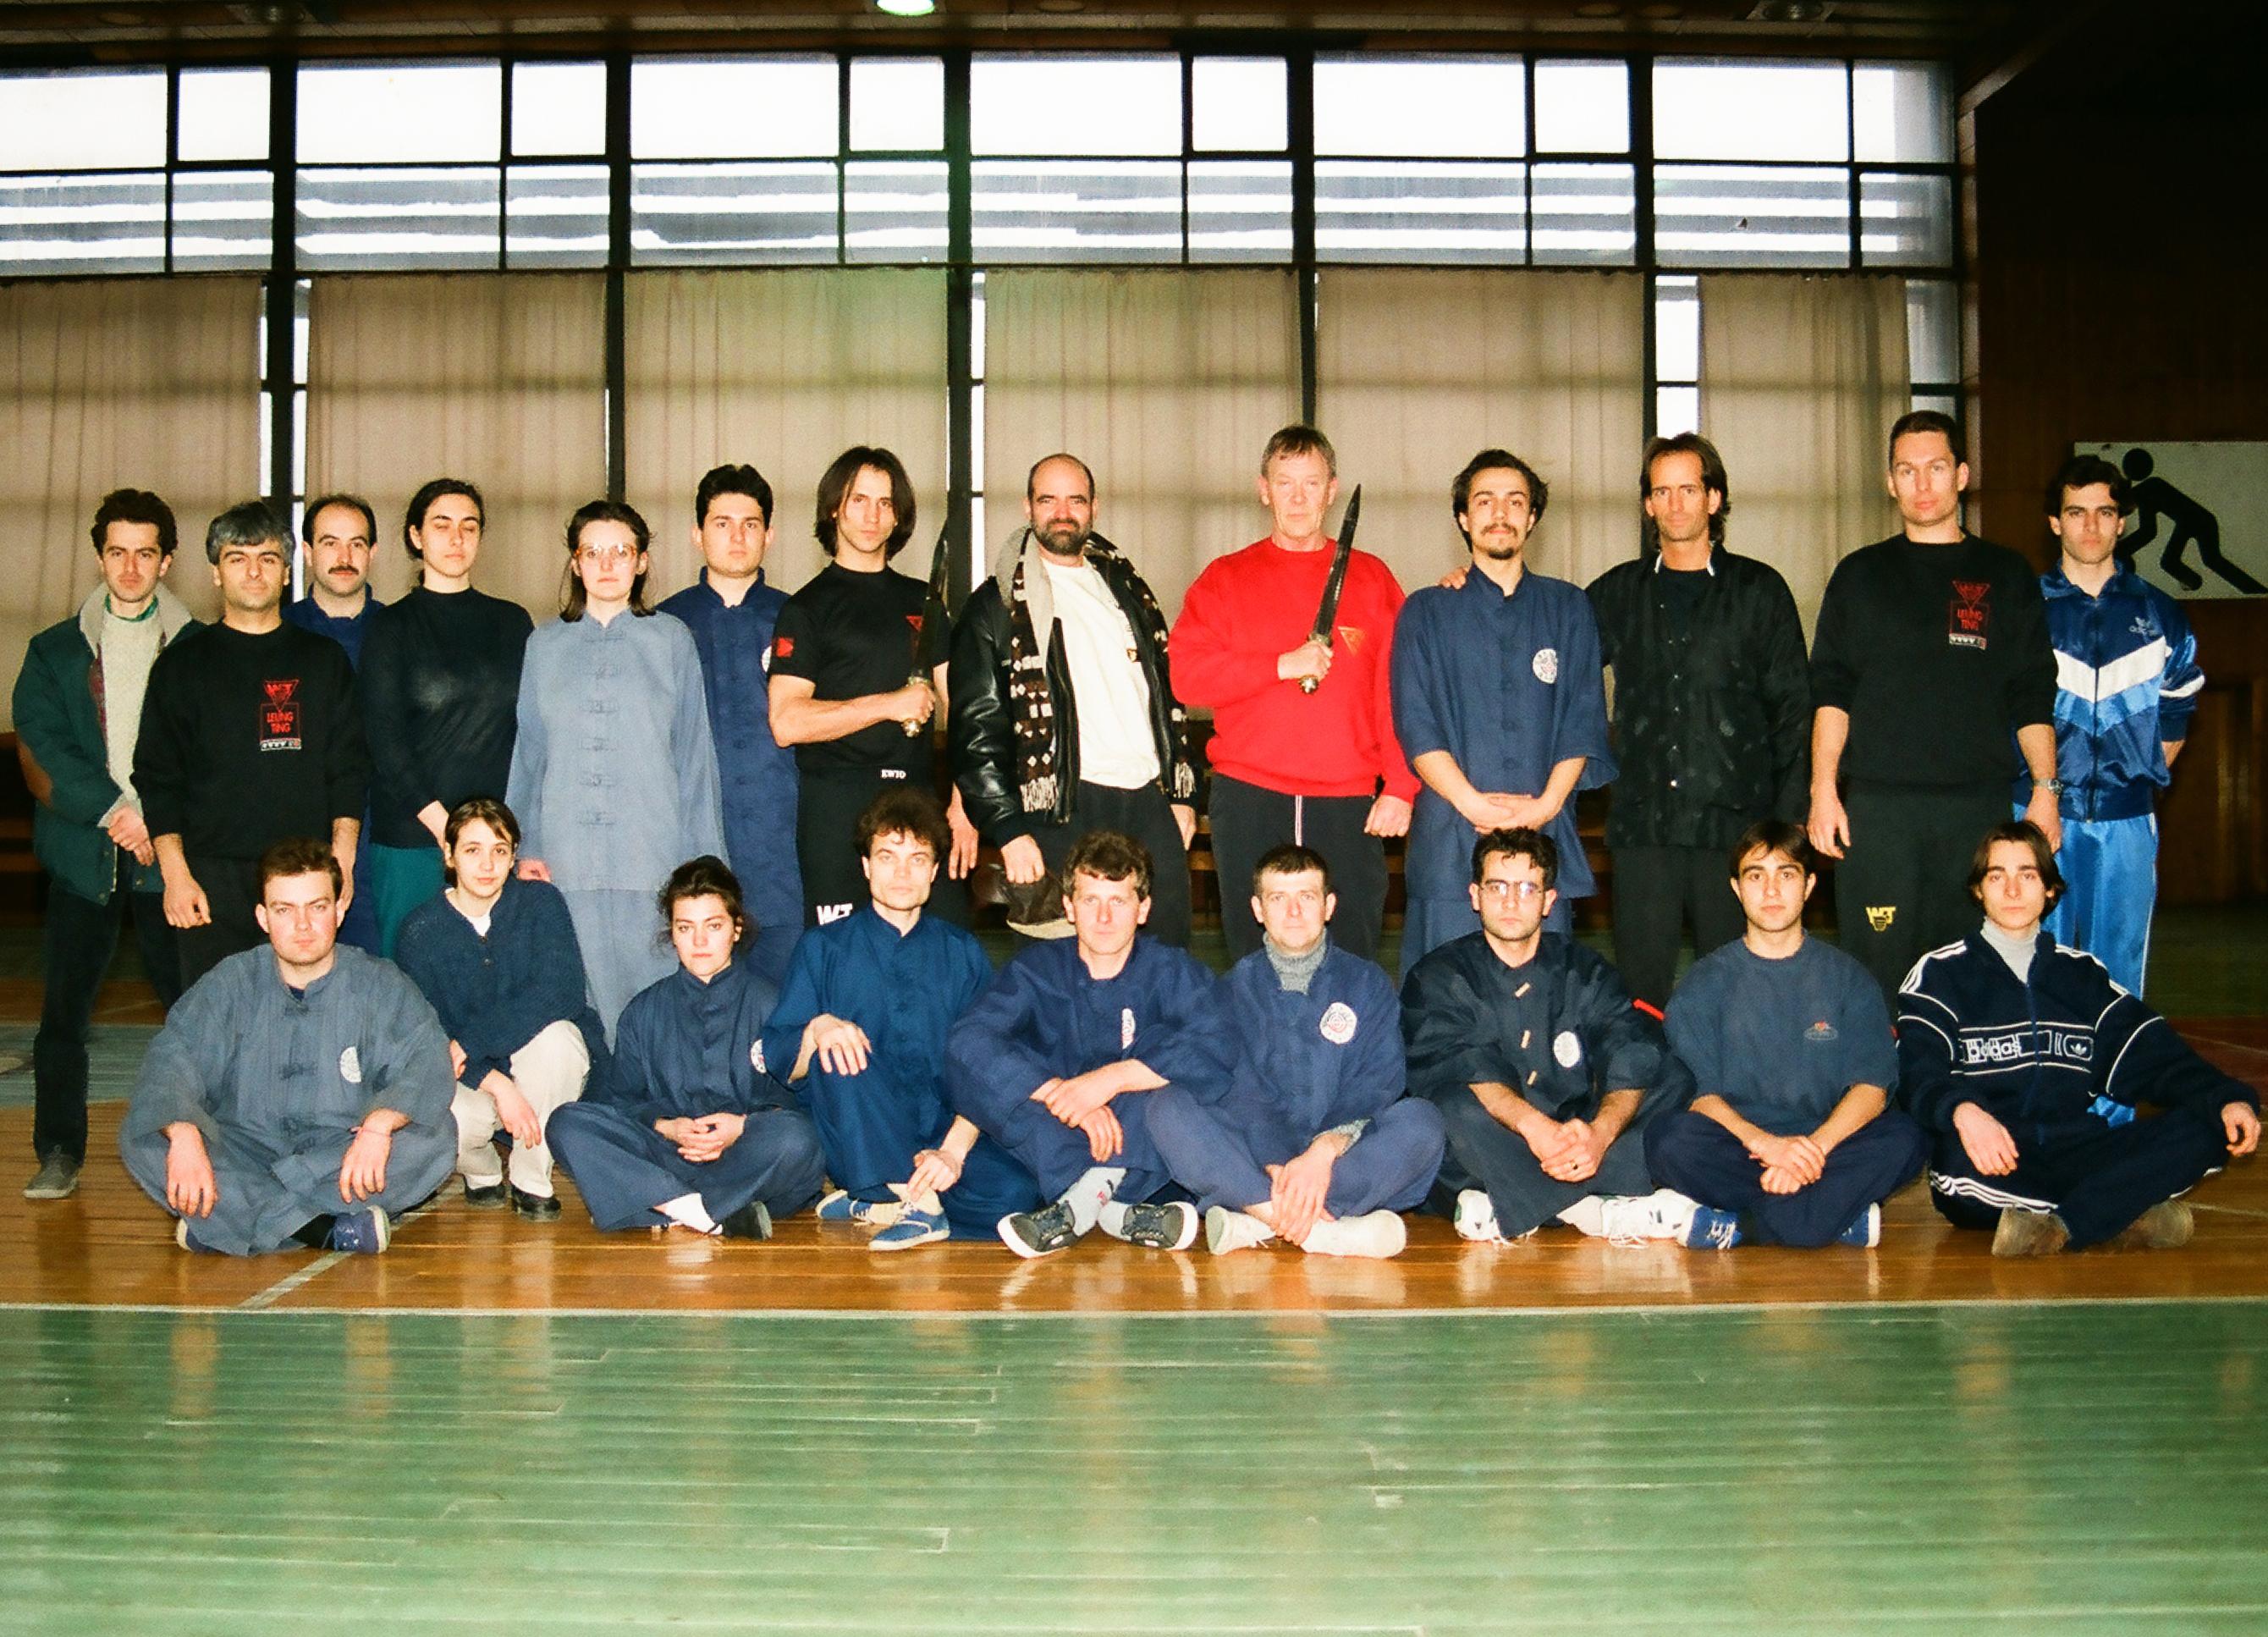 1996 Пловдивски университет